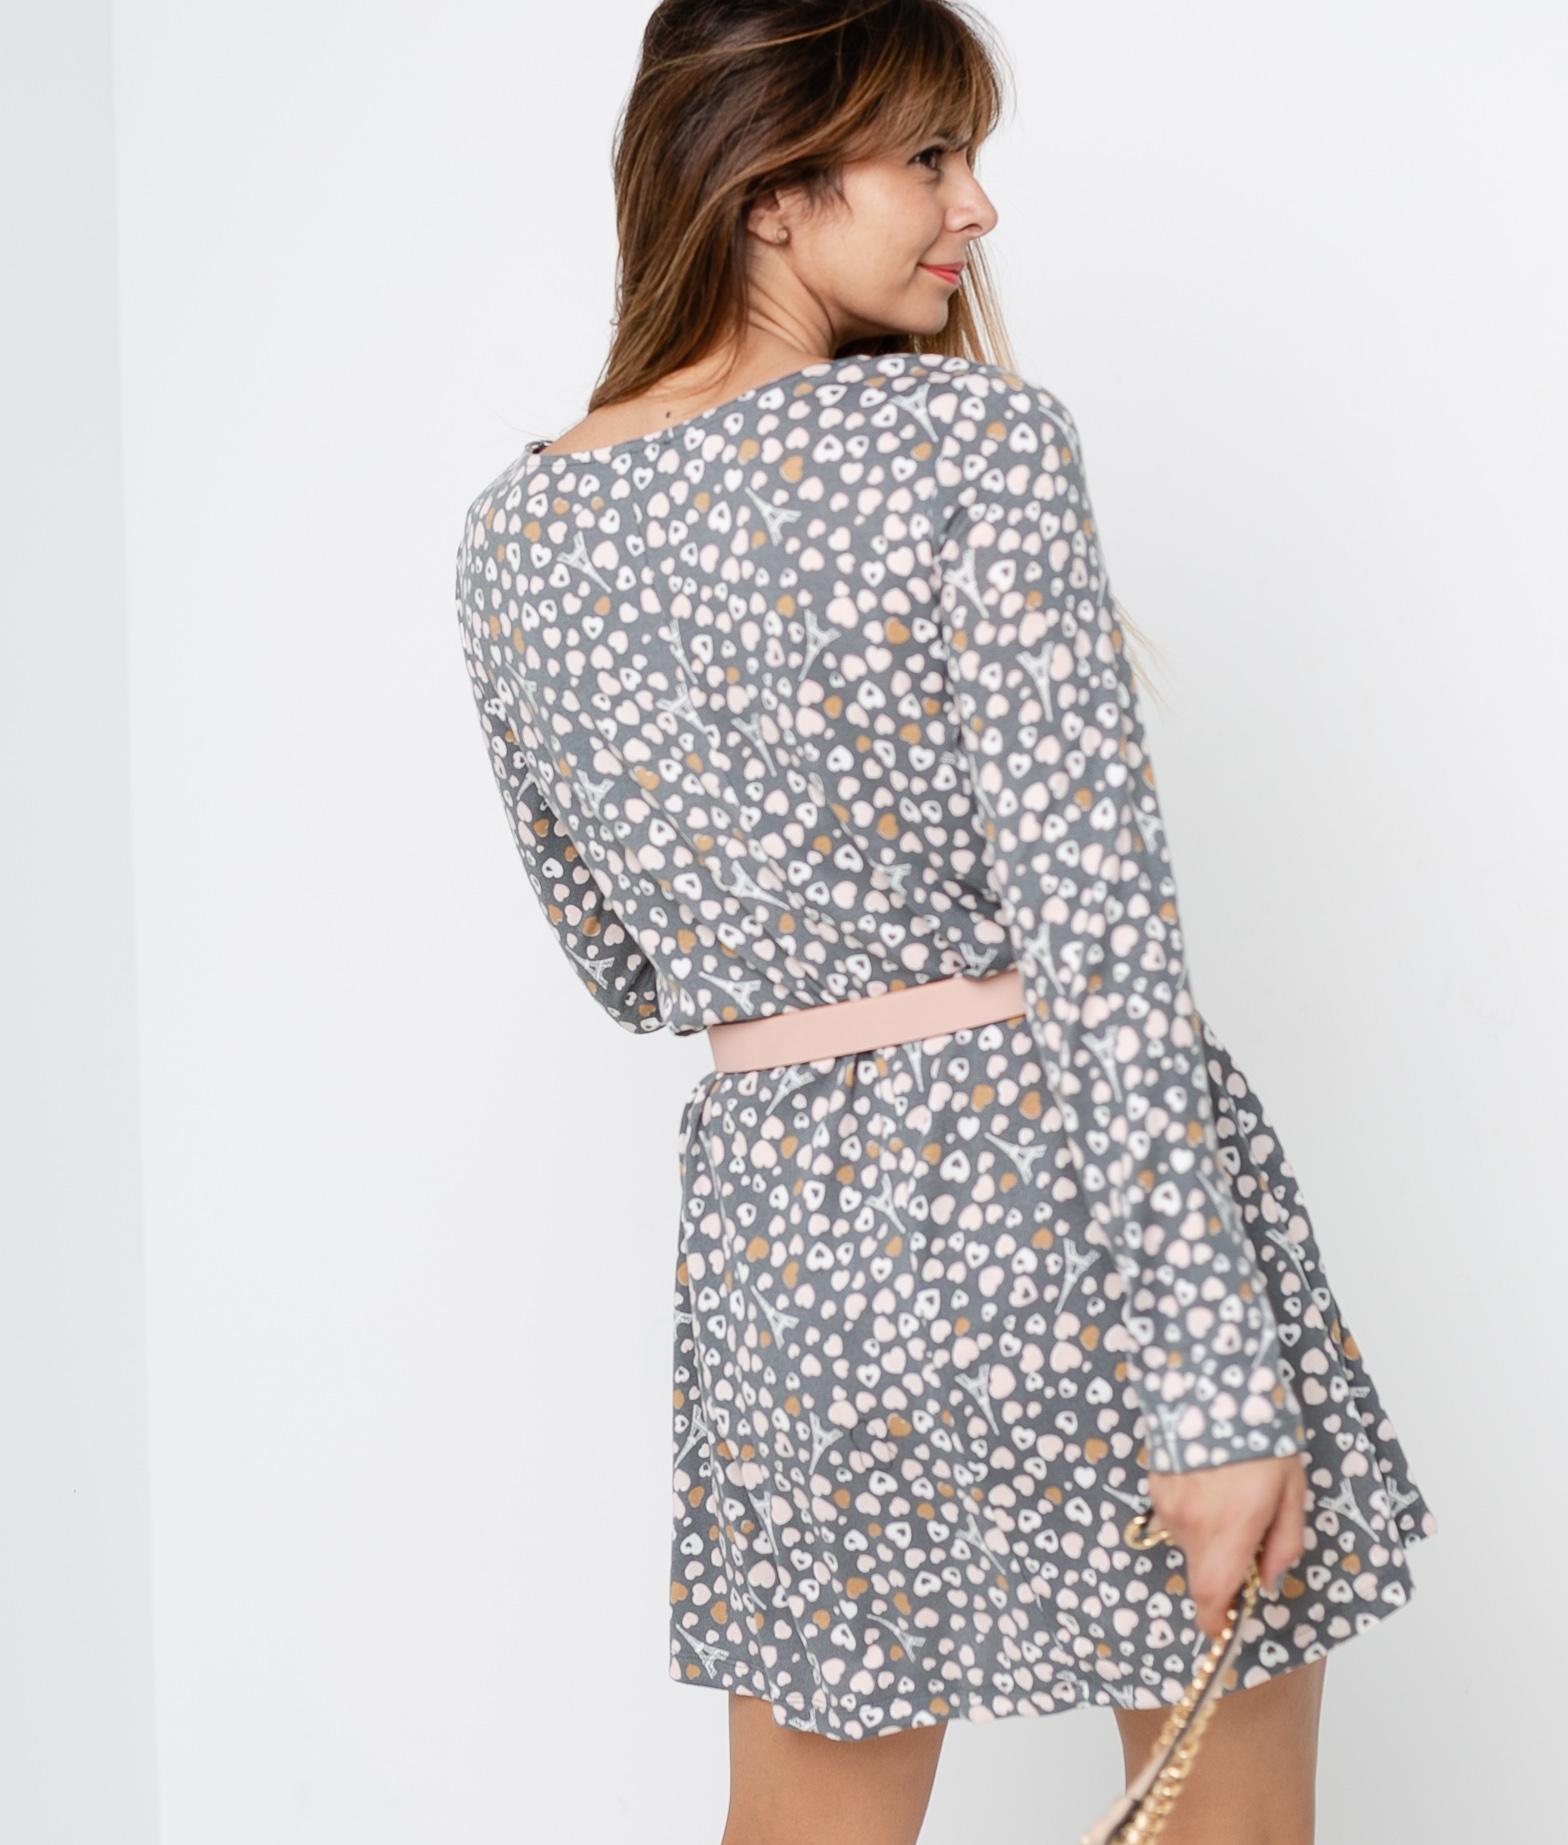 DRESS DIORA - GREY